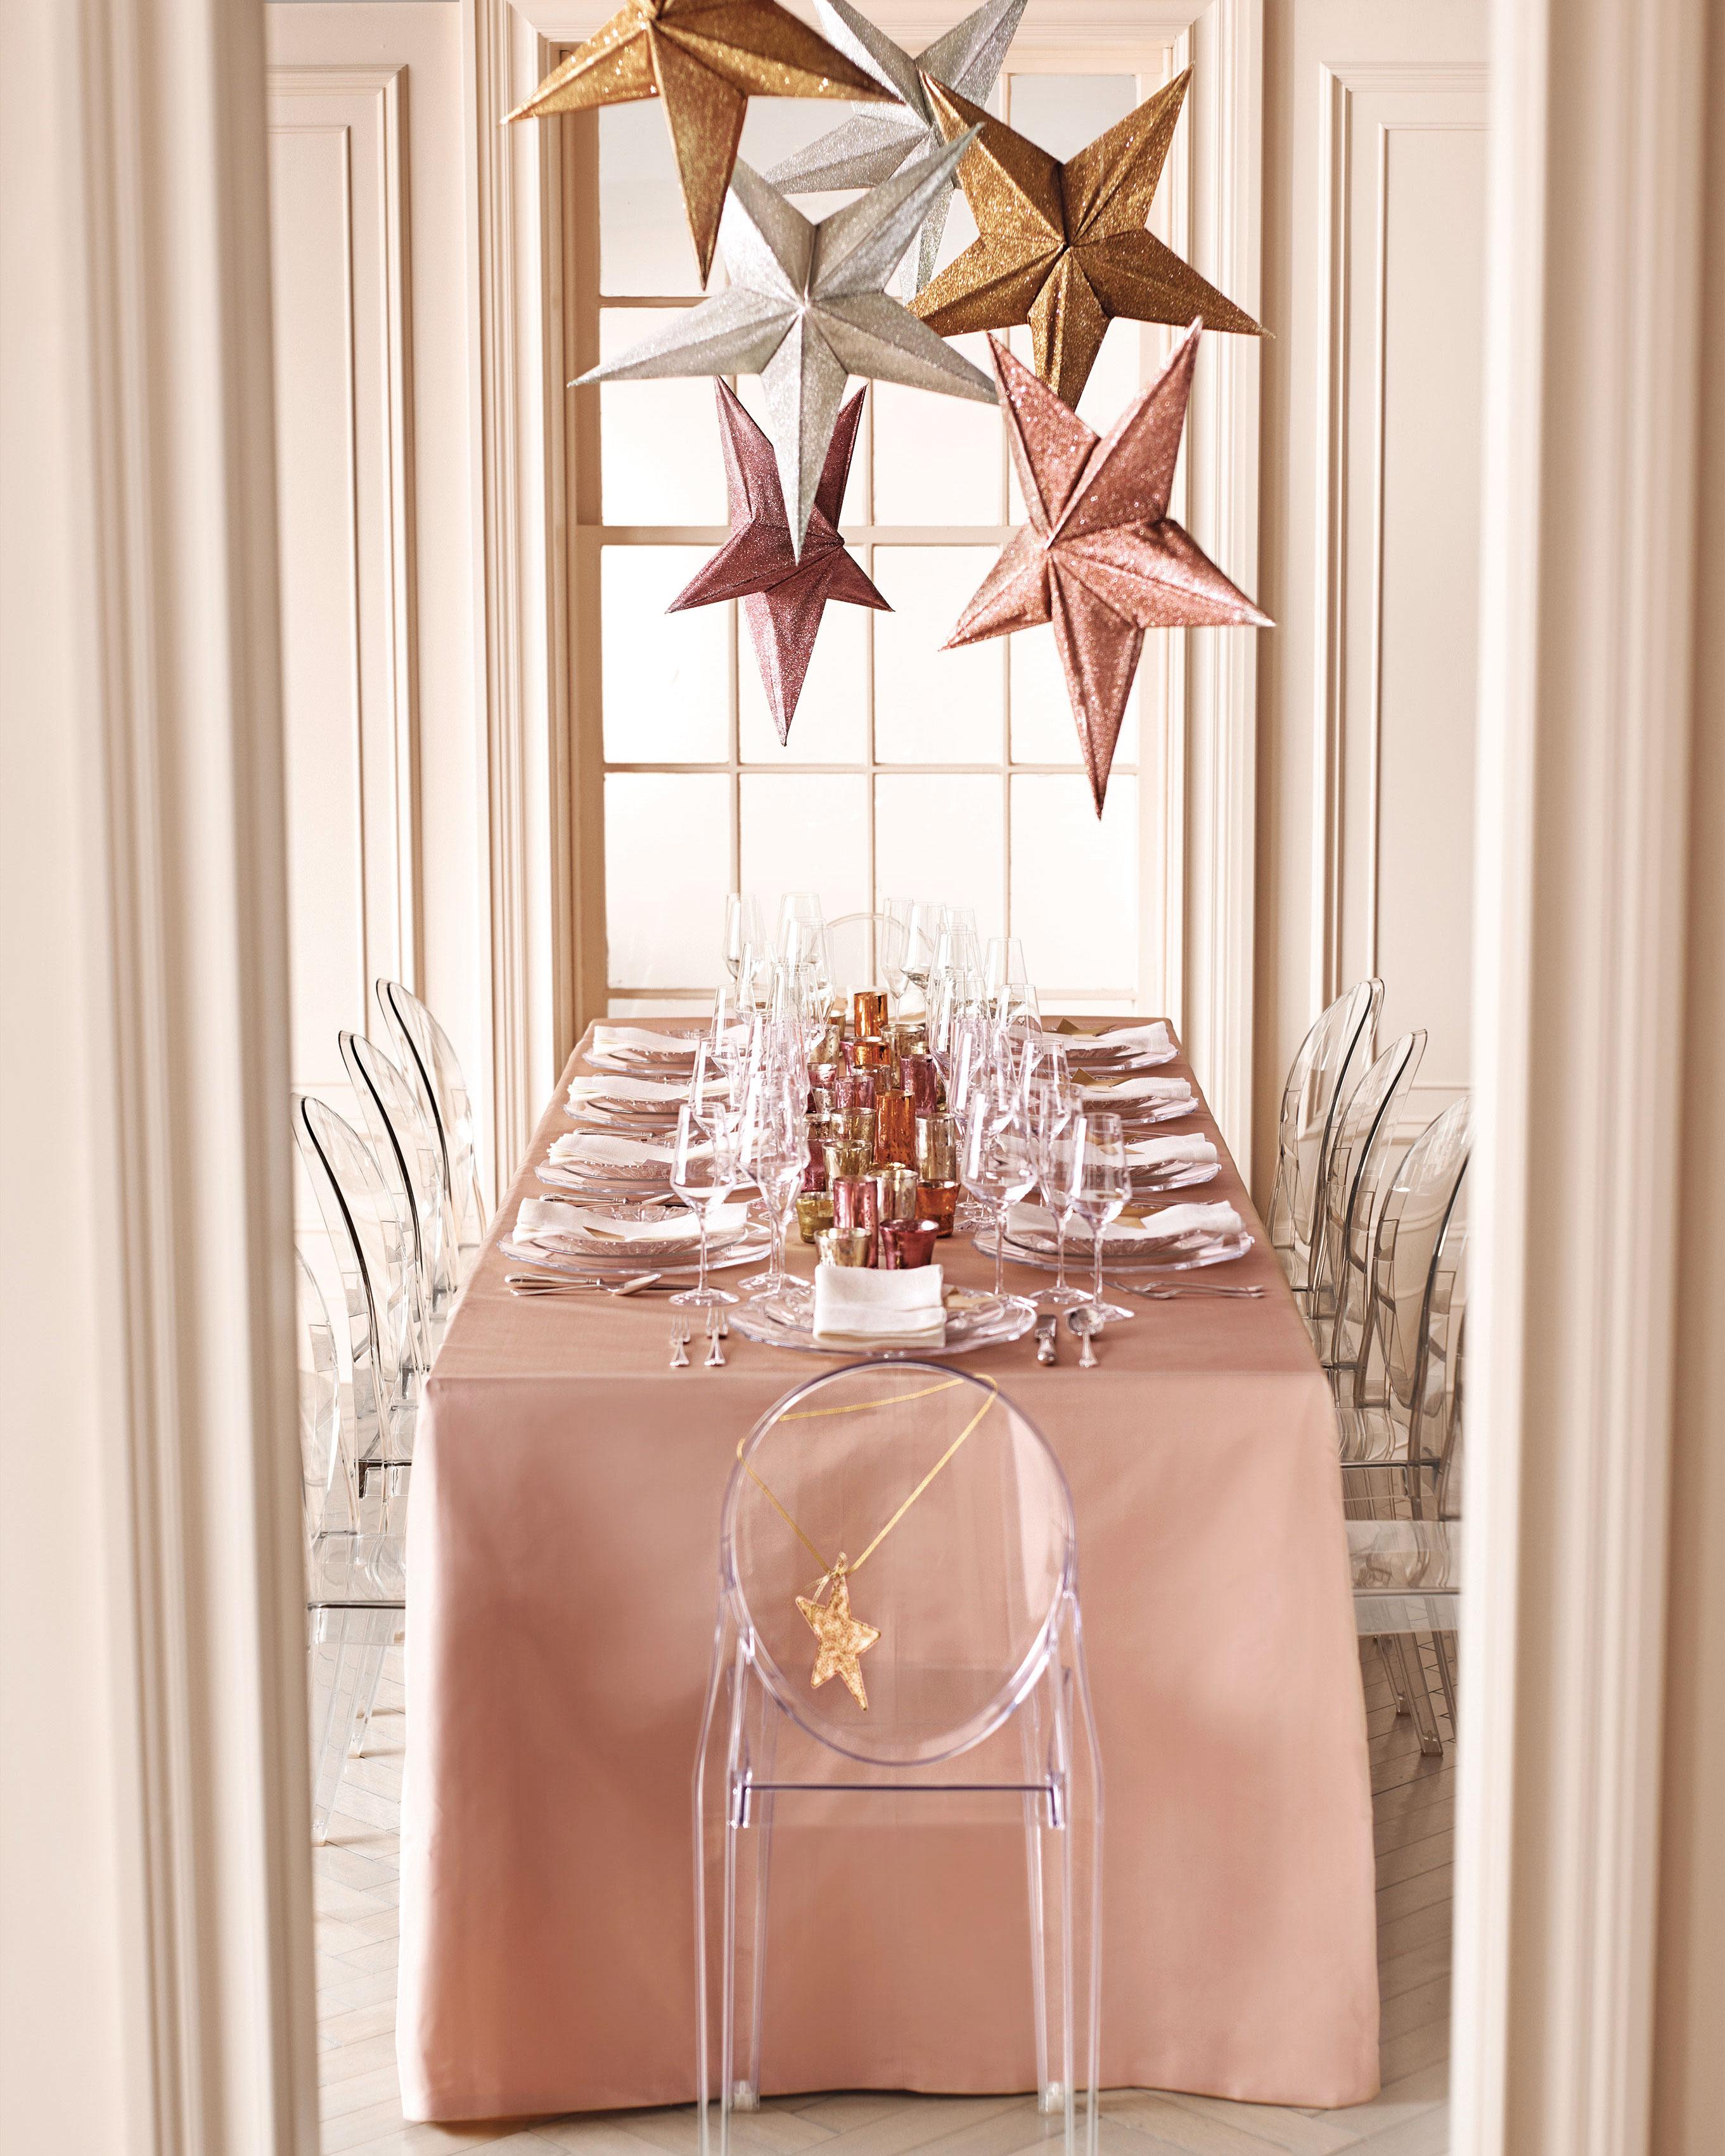 mmwd105260-expert-advice-metallic-palette-table-and-stars.jpg